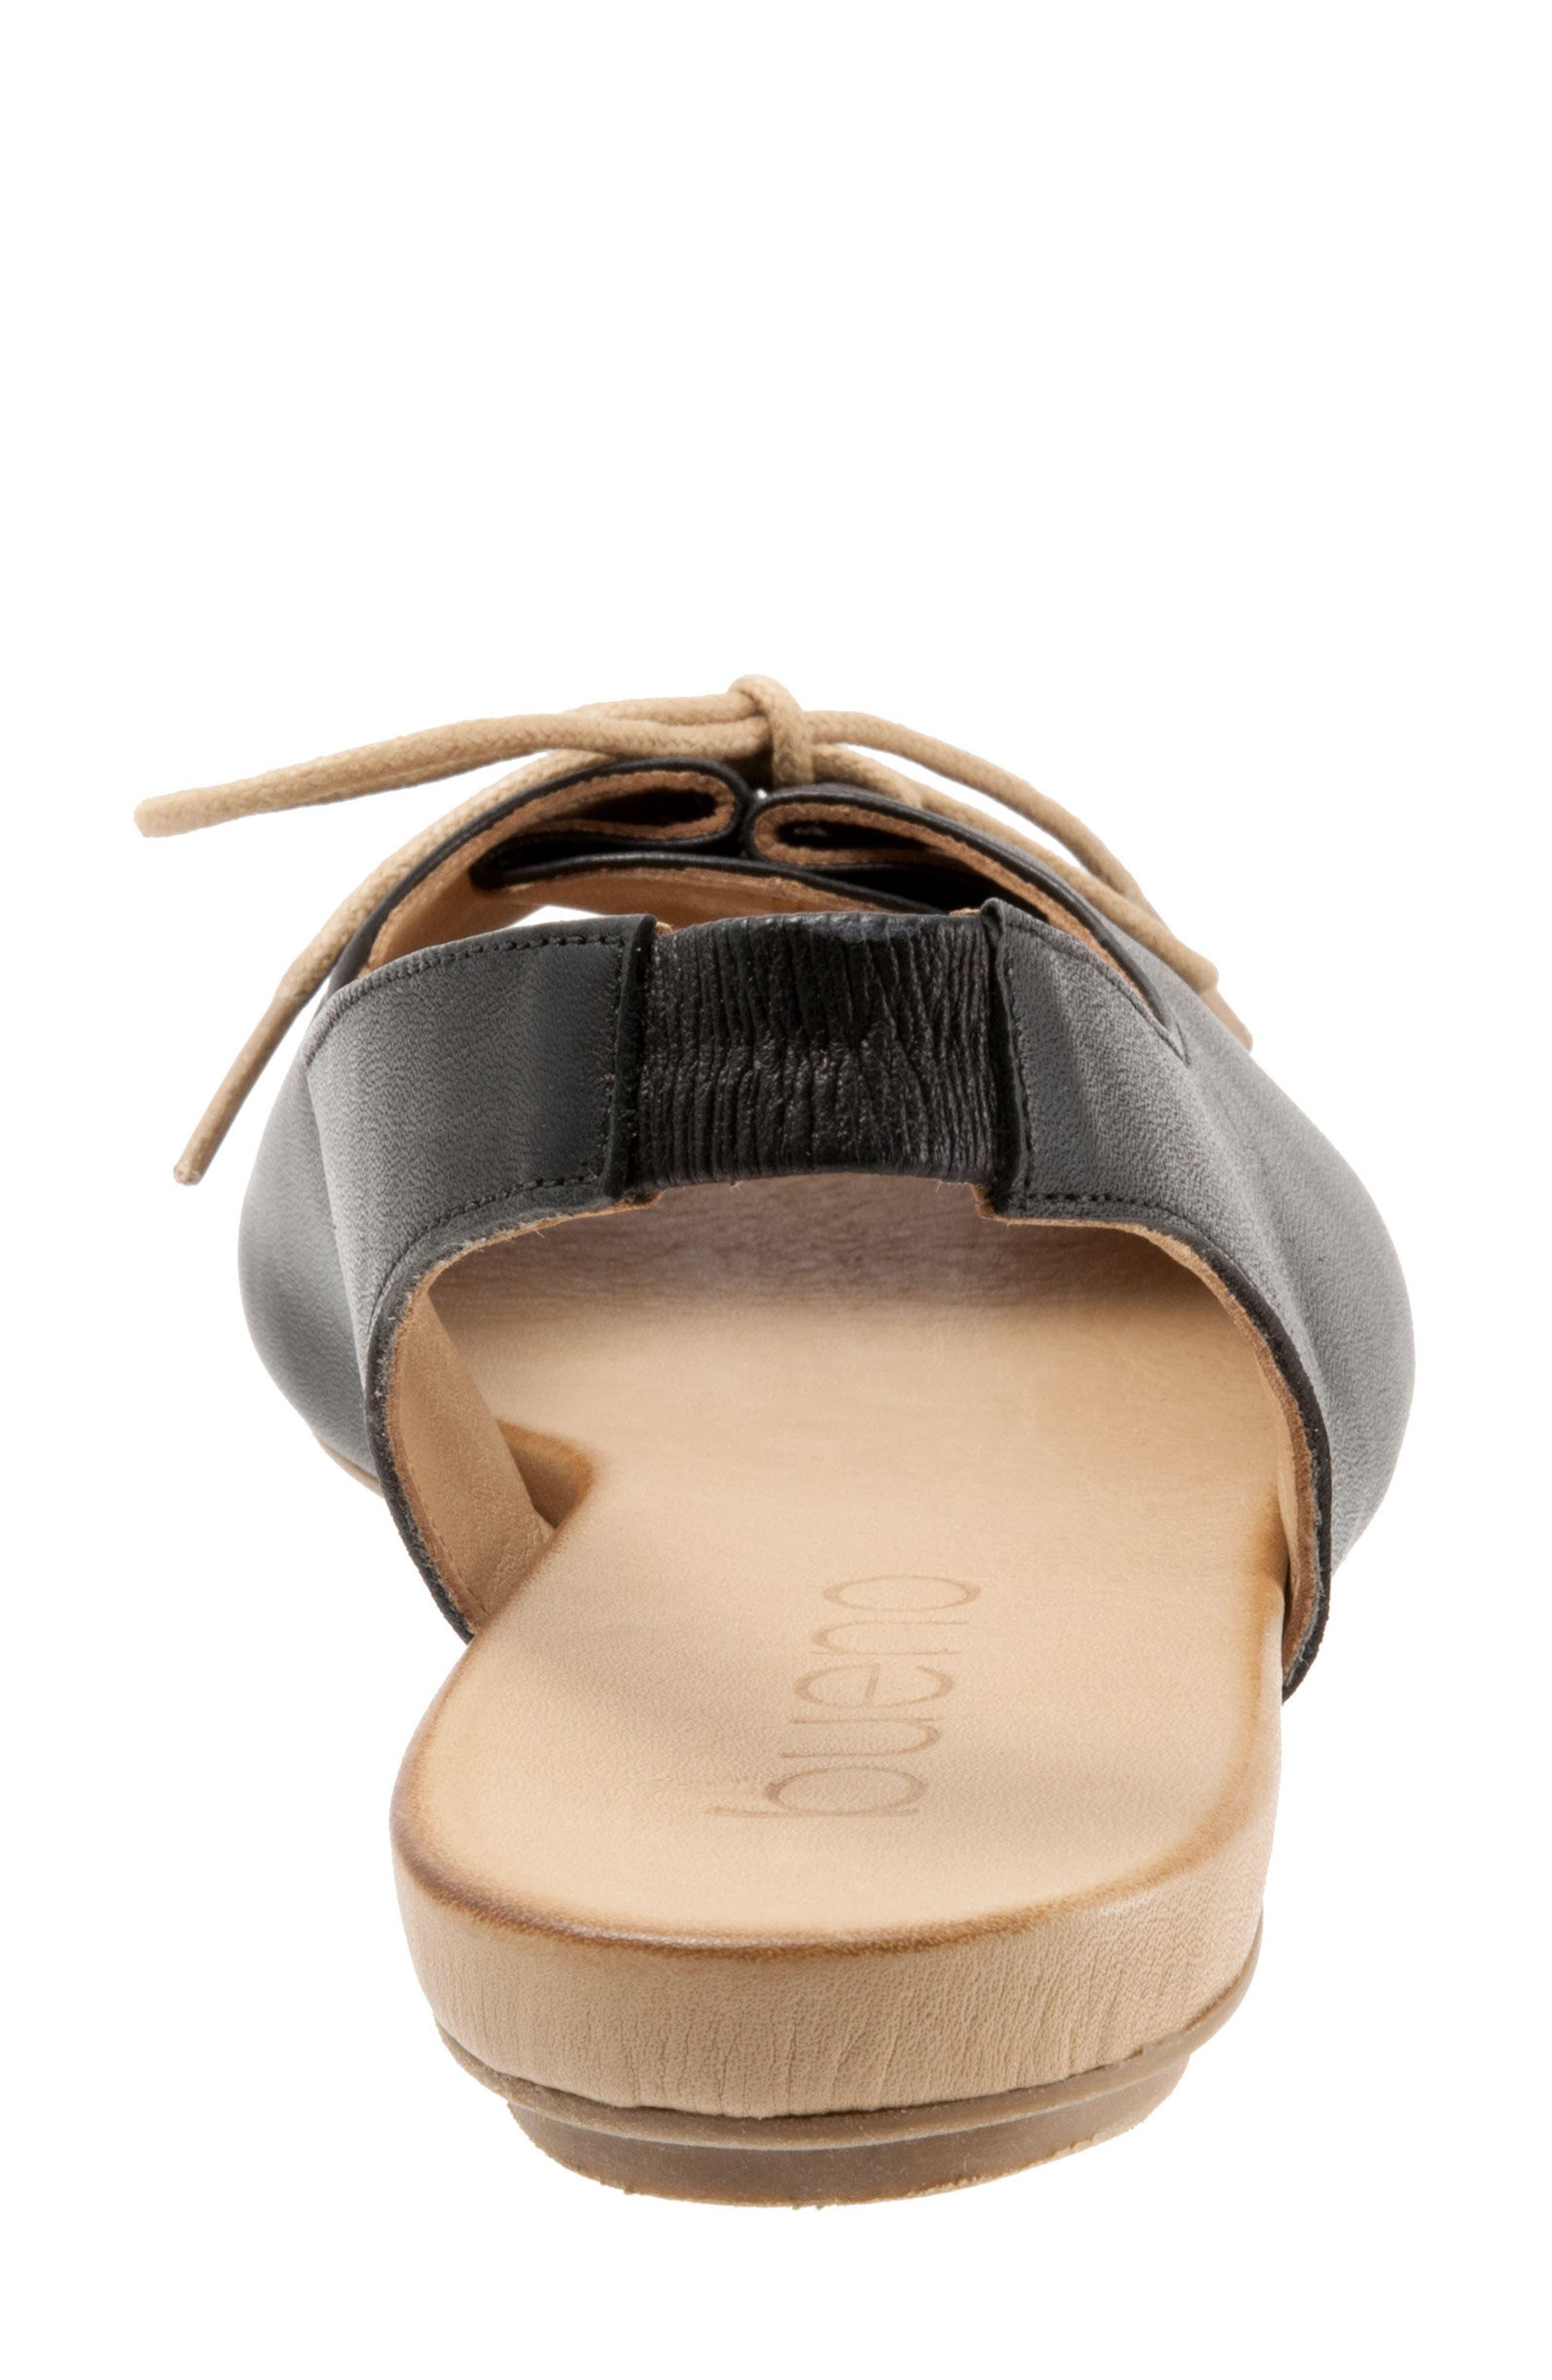 Keely Slingback Tie Sandal,                             Alternate thumbnail 7, color,                             BLACK LEATHER